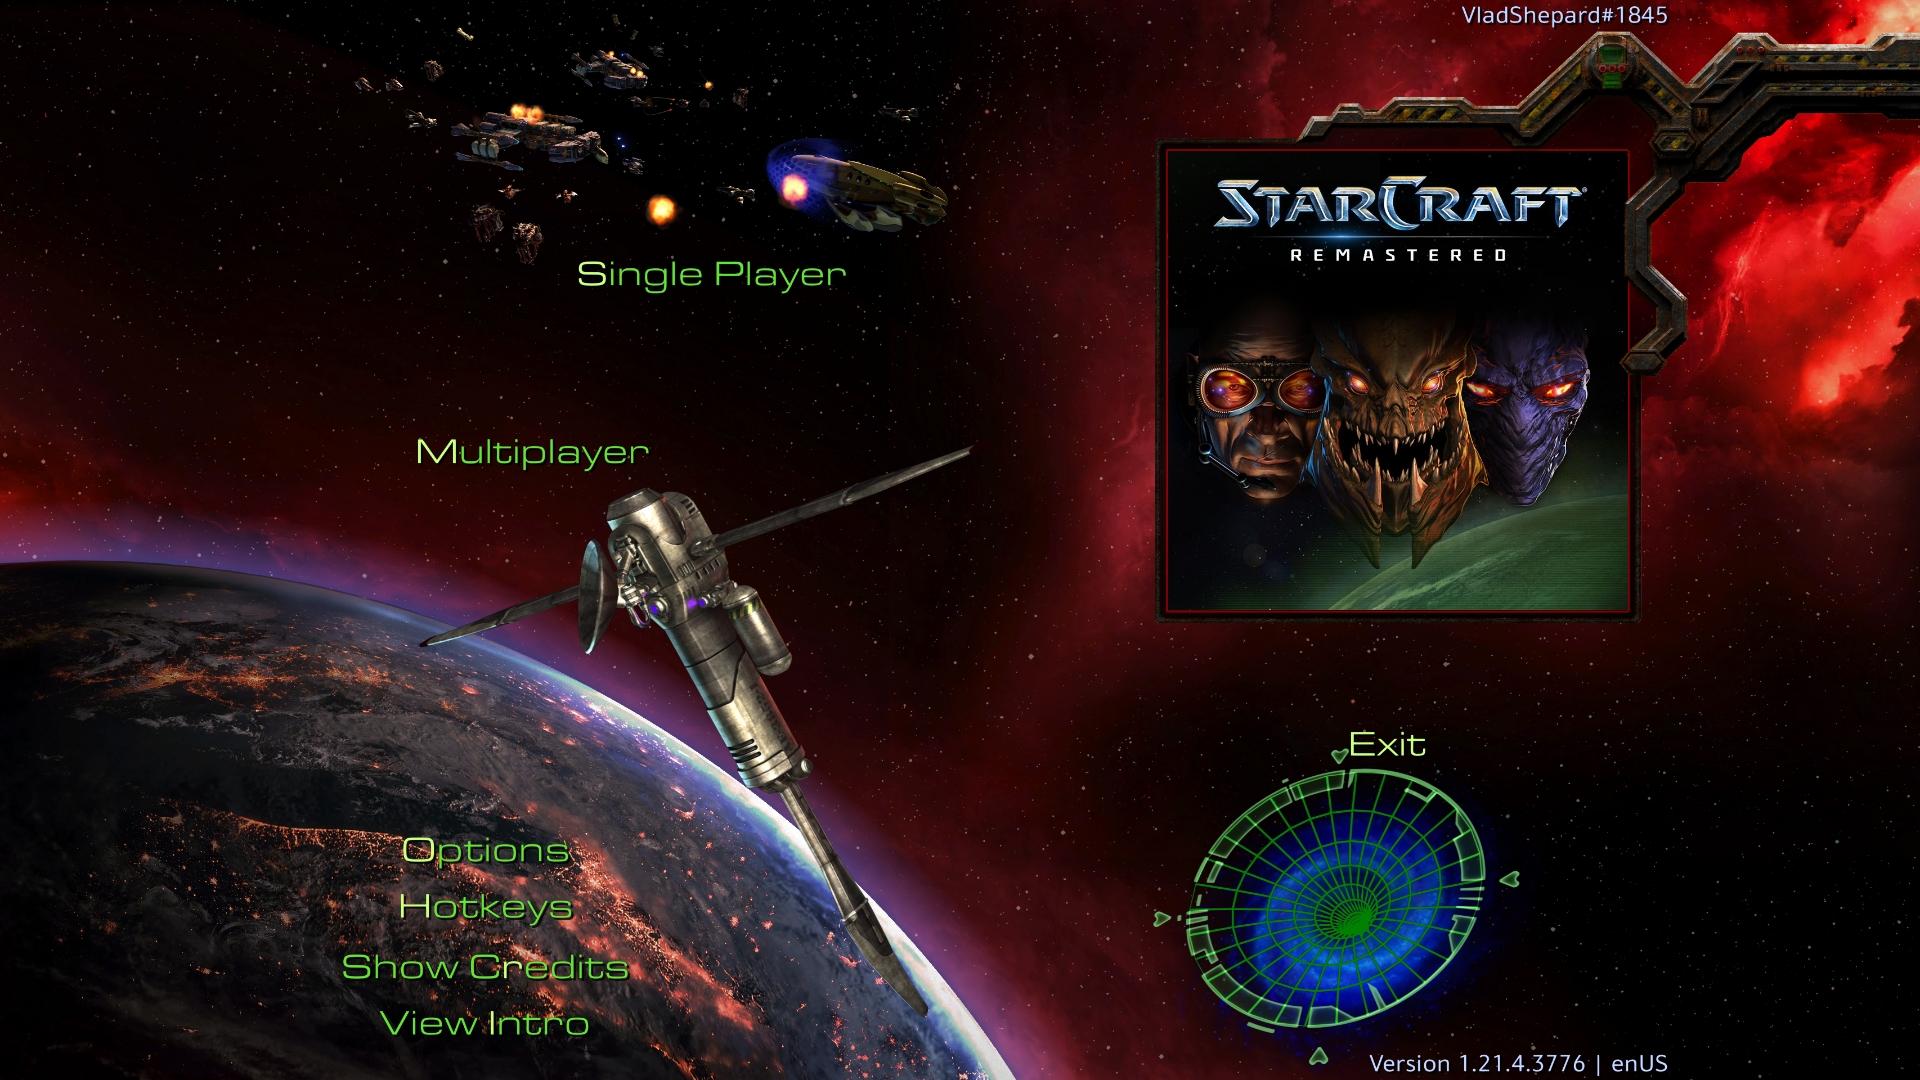 StarCraft_2018_03_22_00_14_10_426.jpg